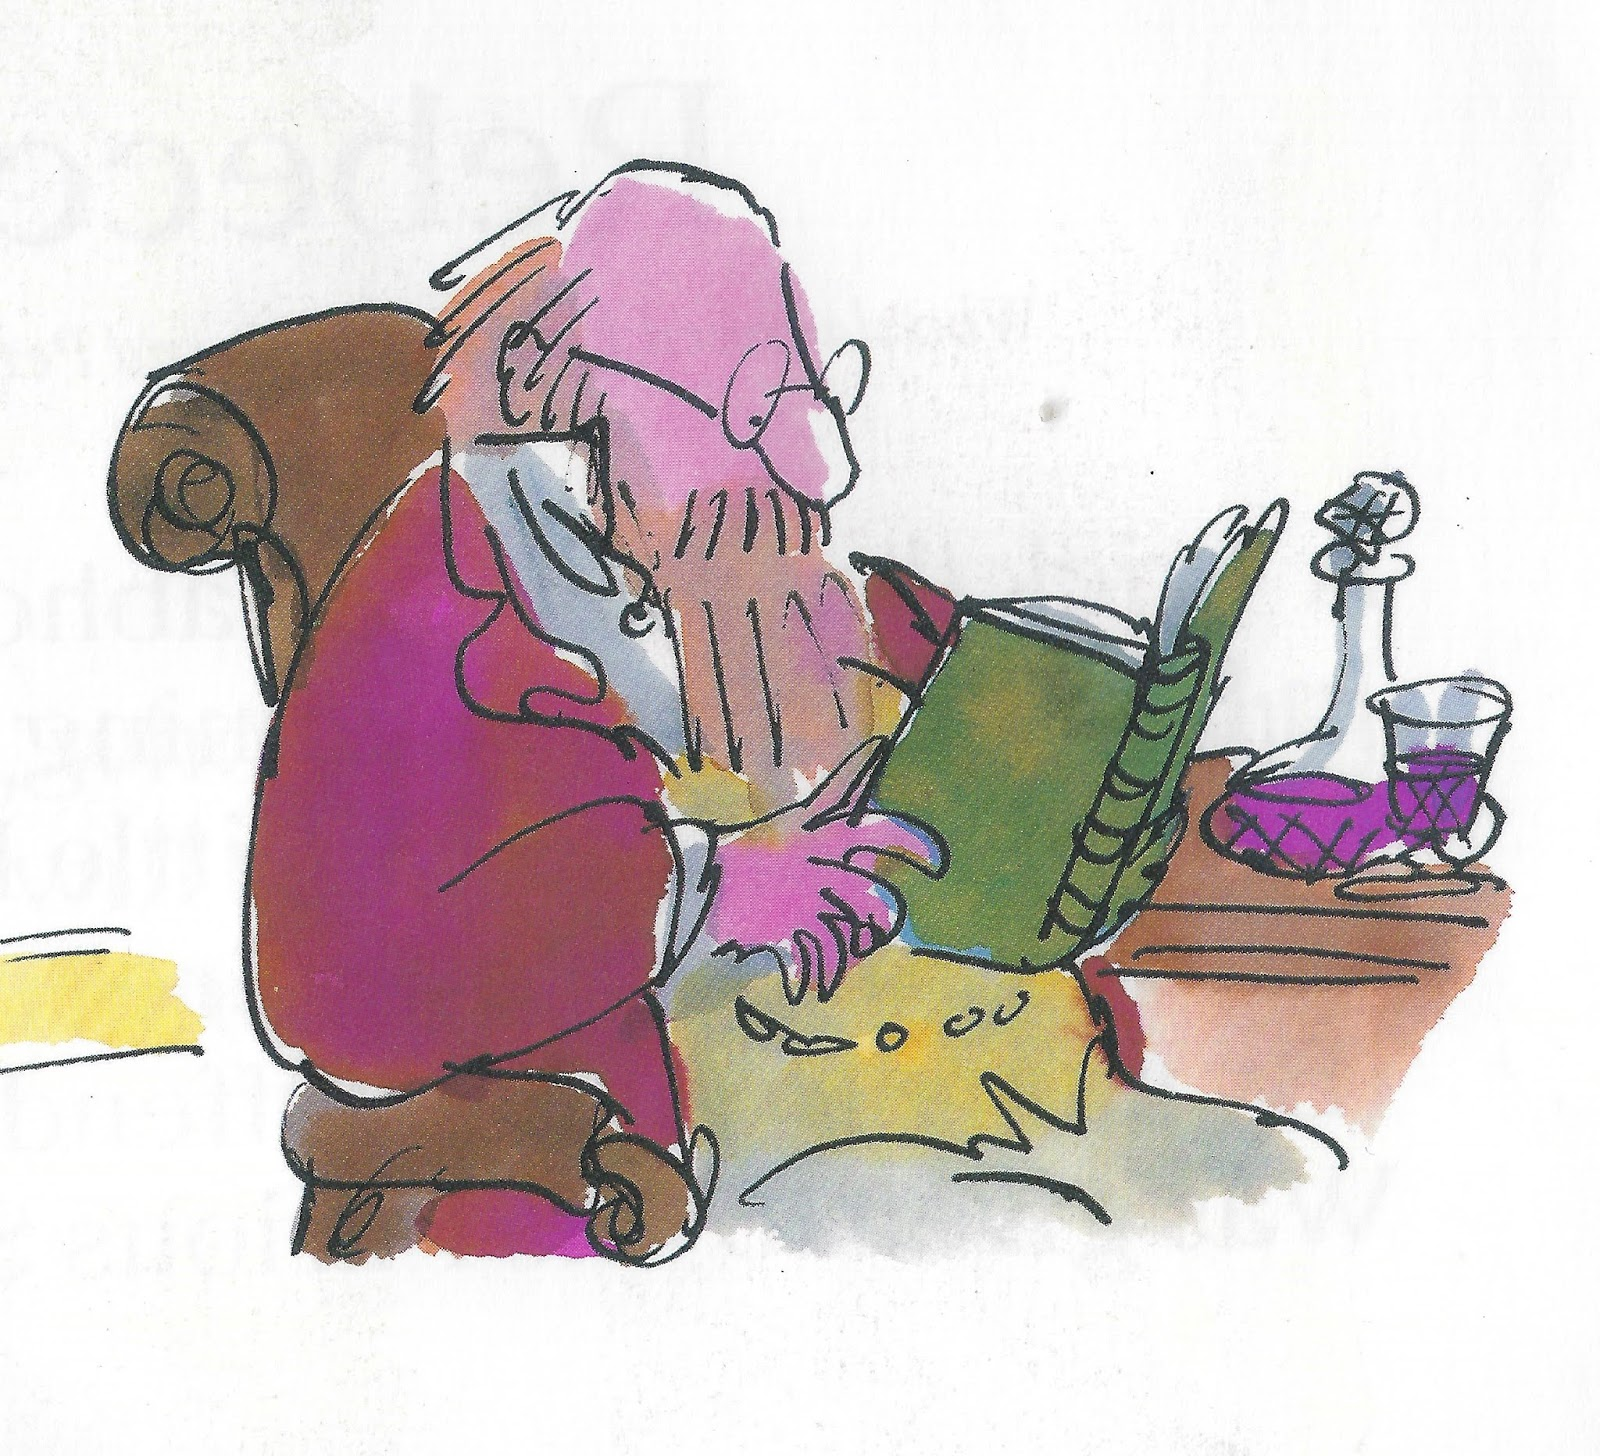 AGNEW READING